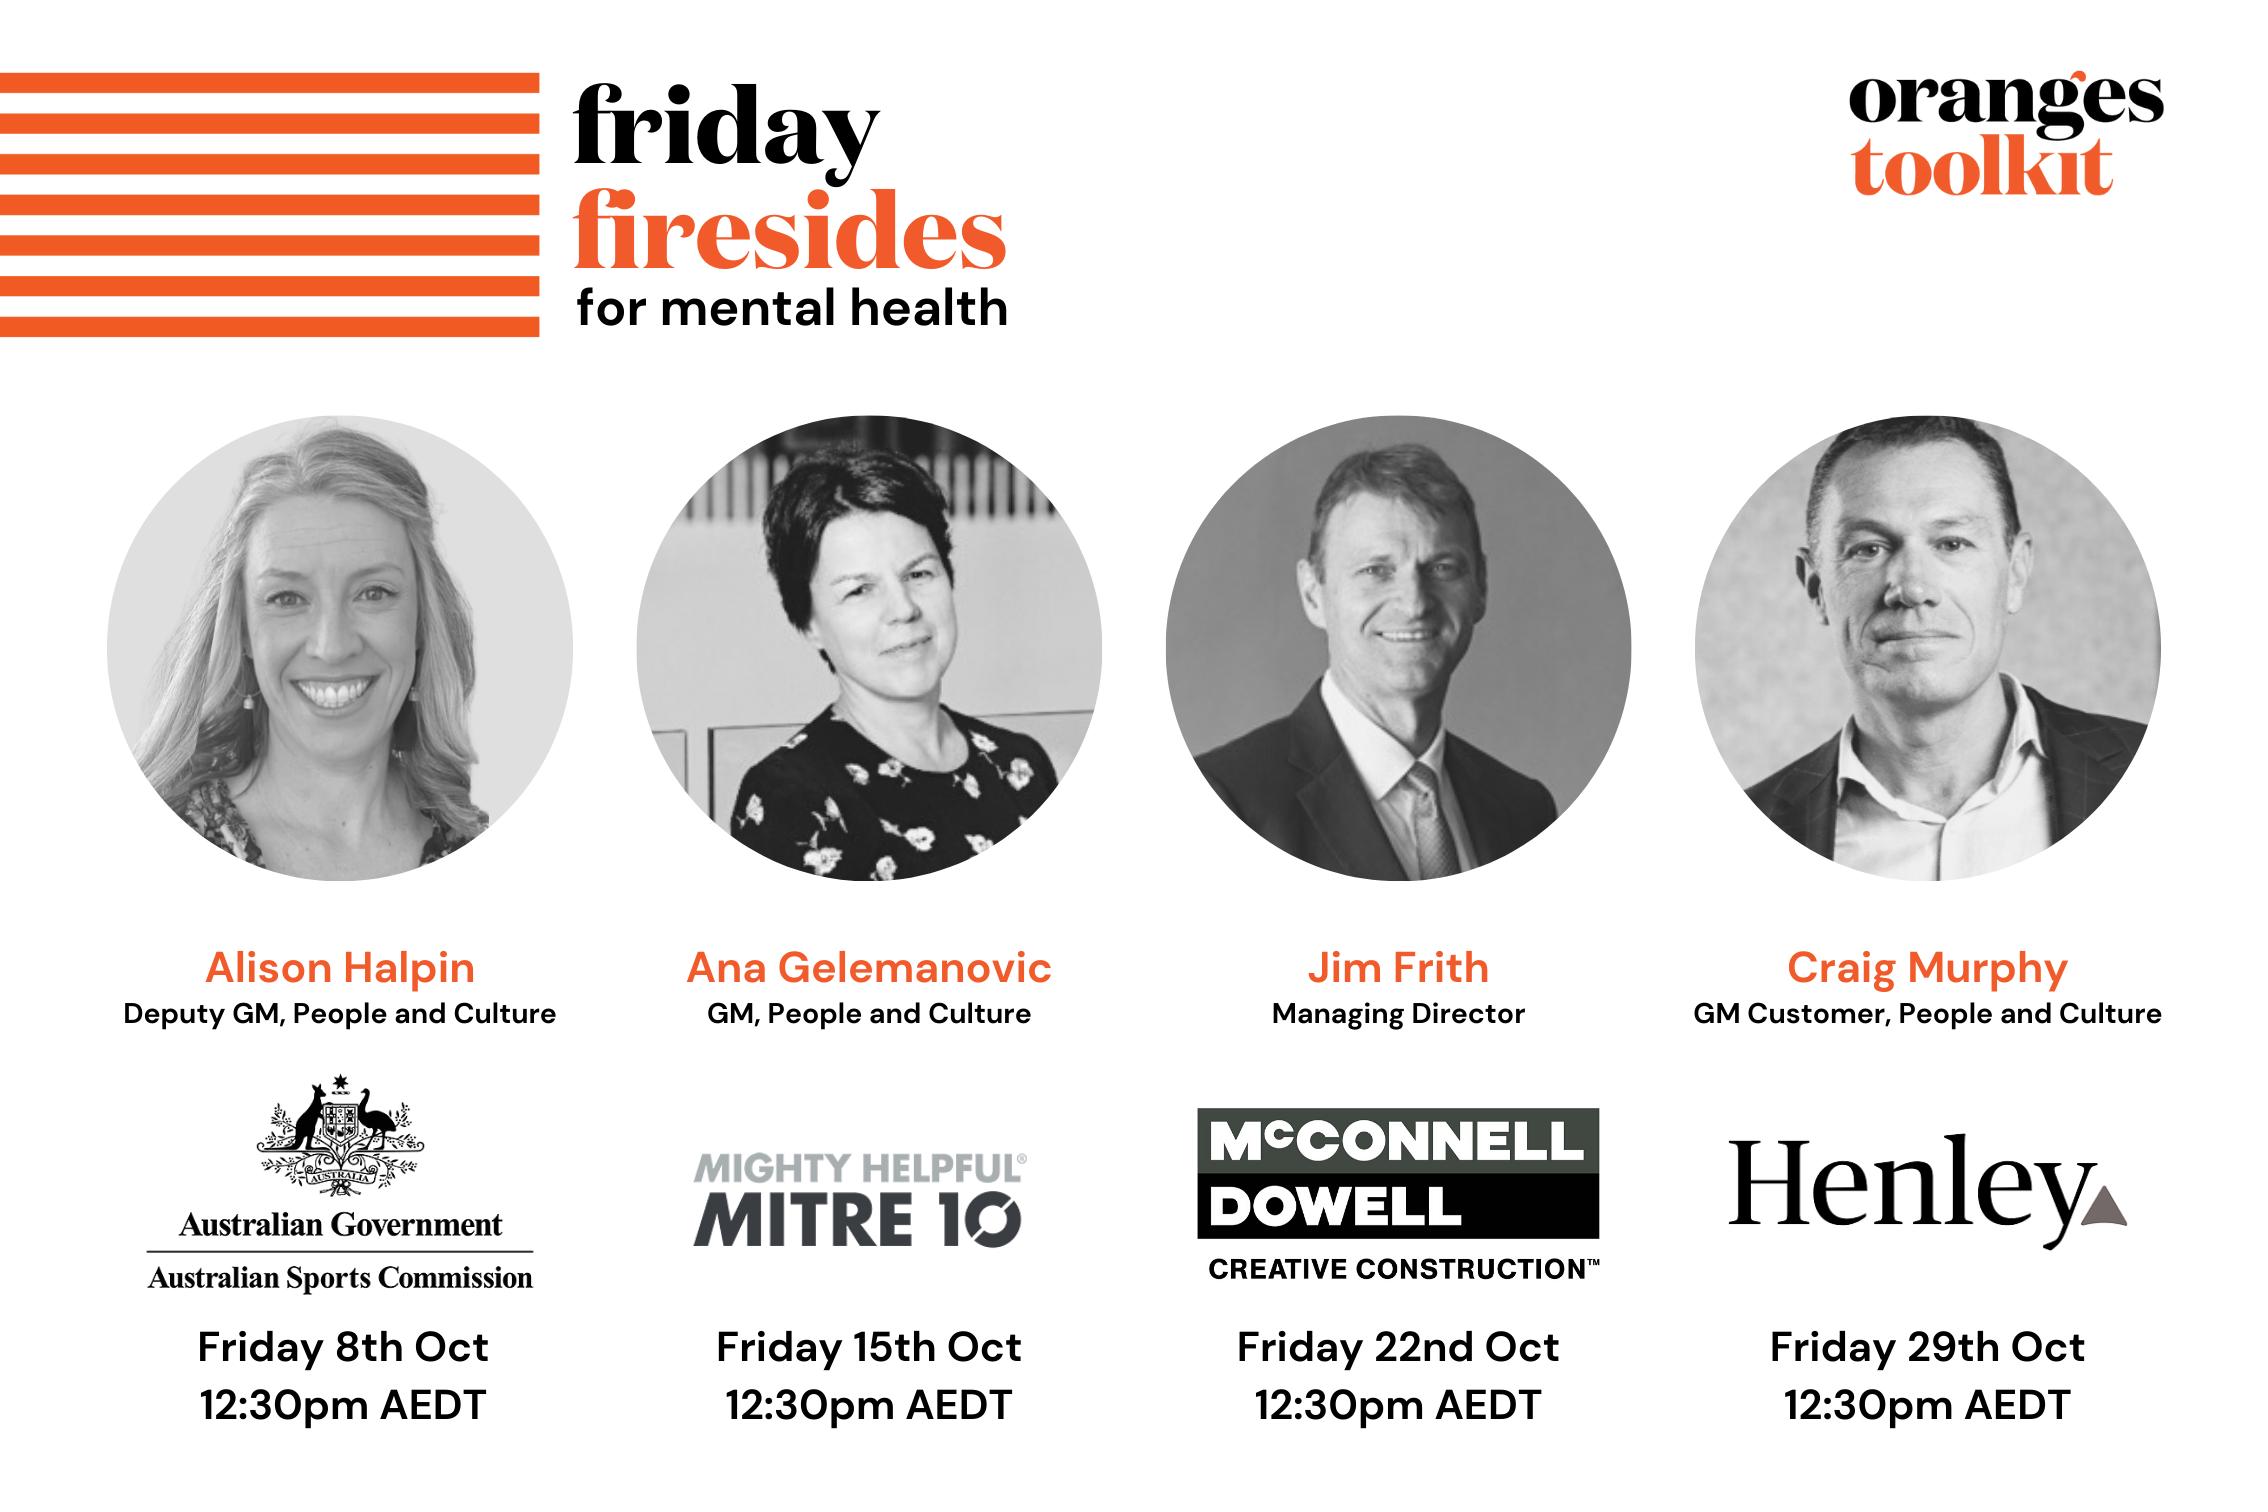 The Oranges Toolkit's Friday Firesides for Mental Health speaker line-up